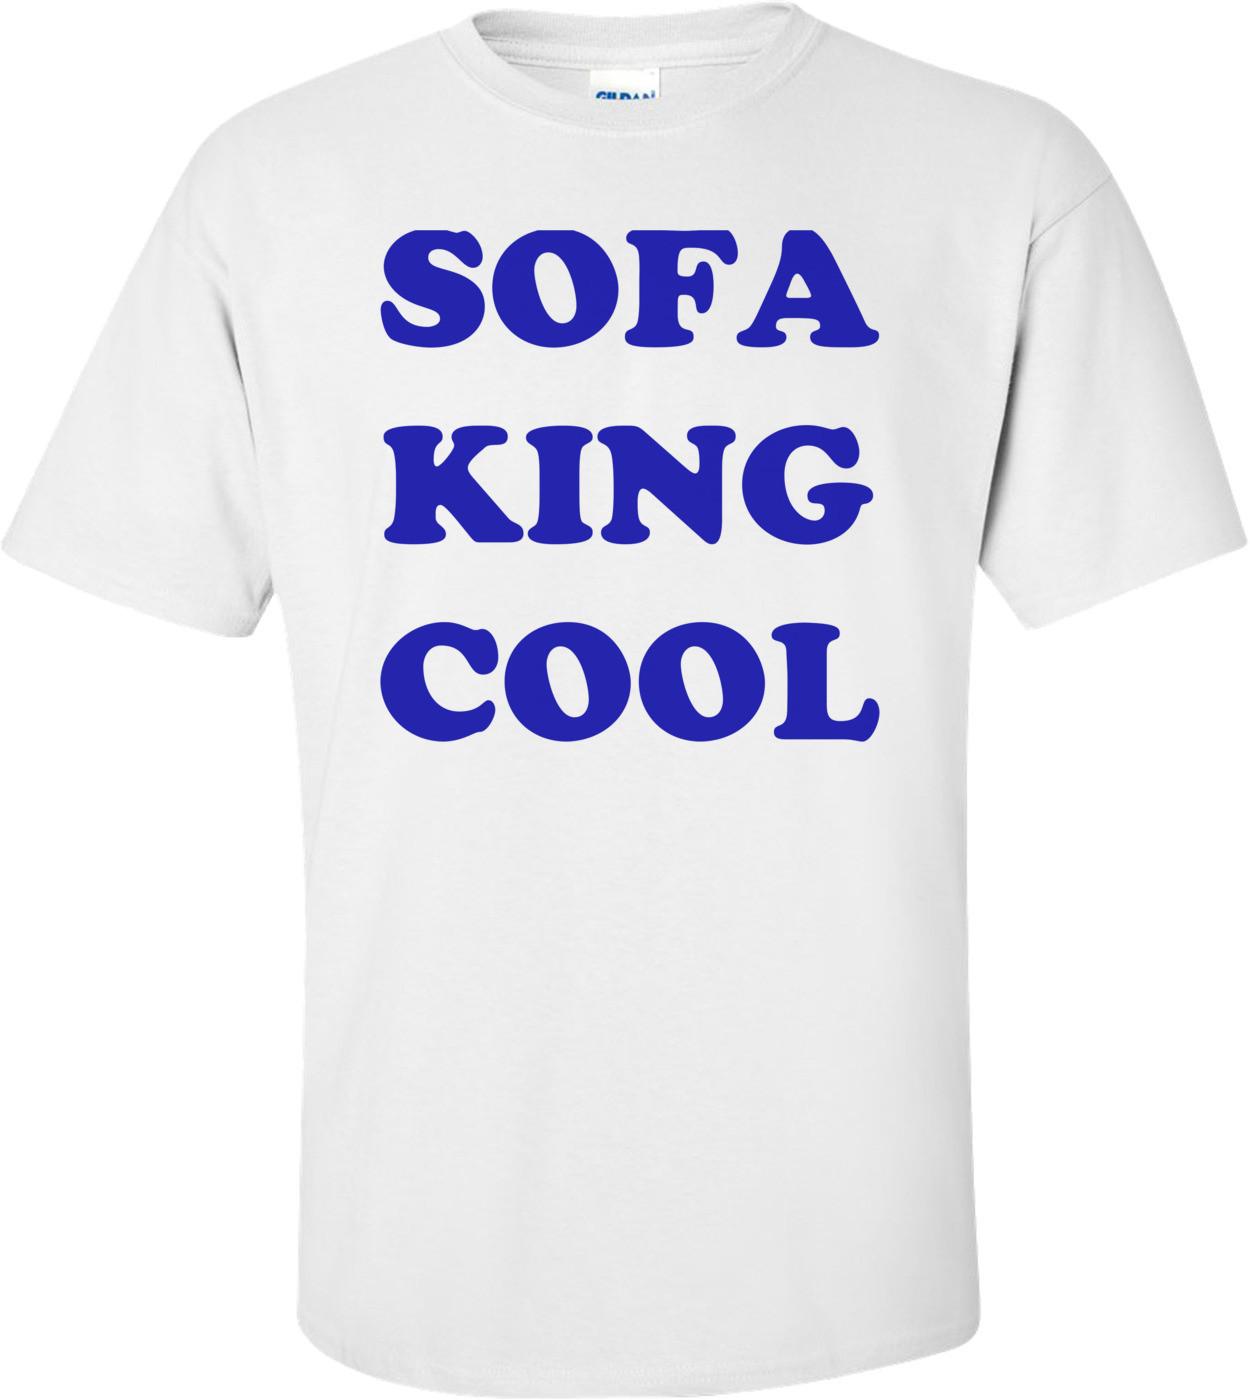 SOFA KING COOL Shirt